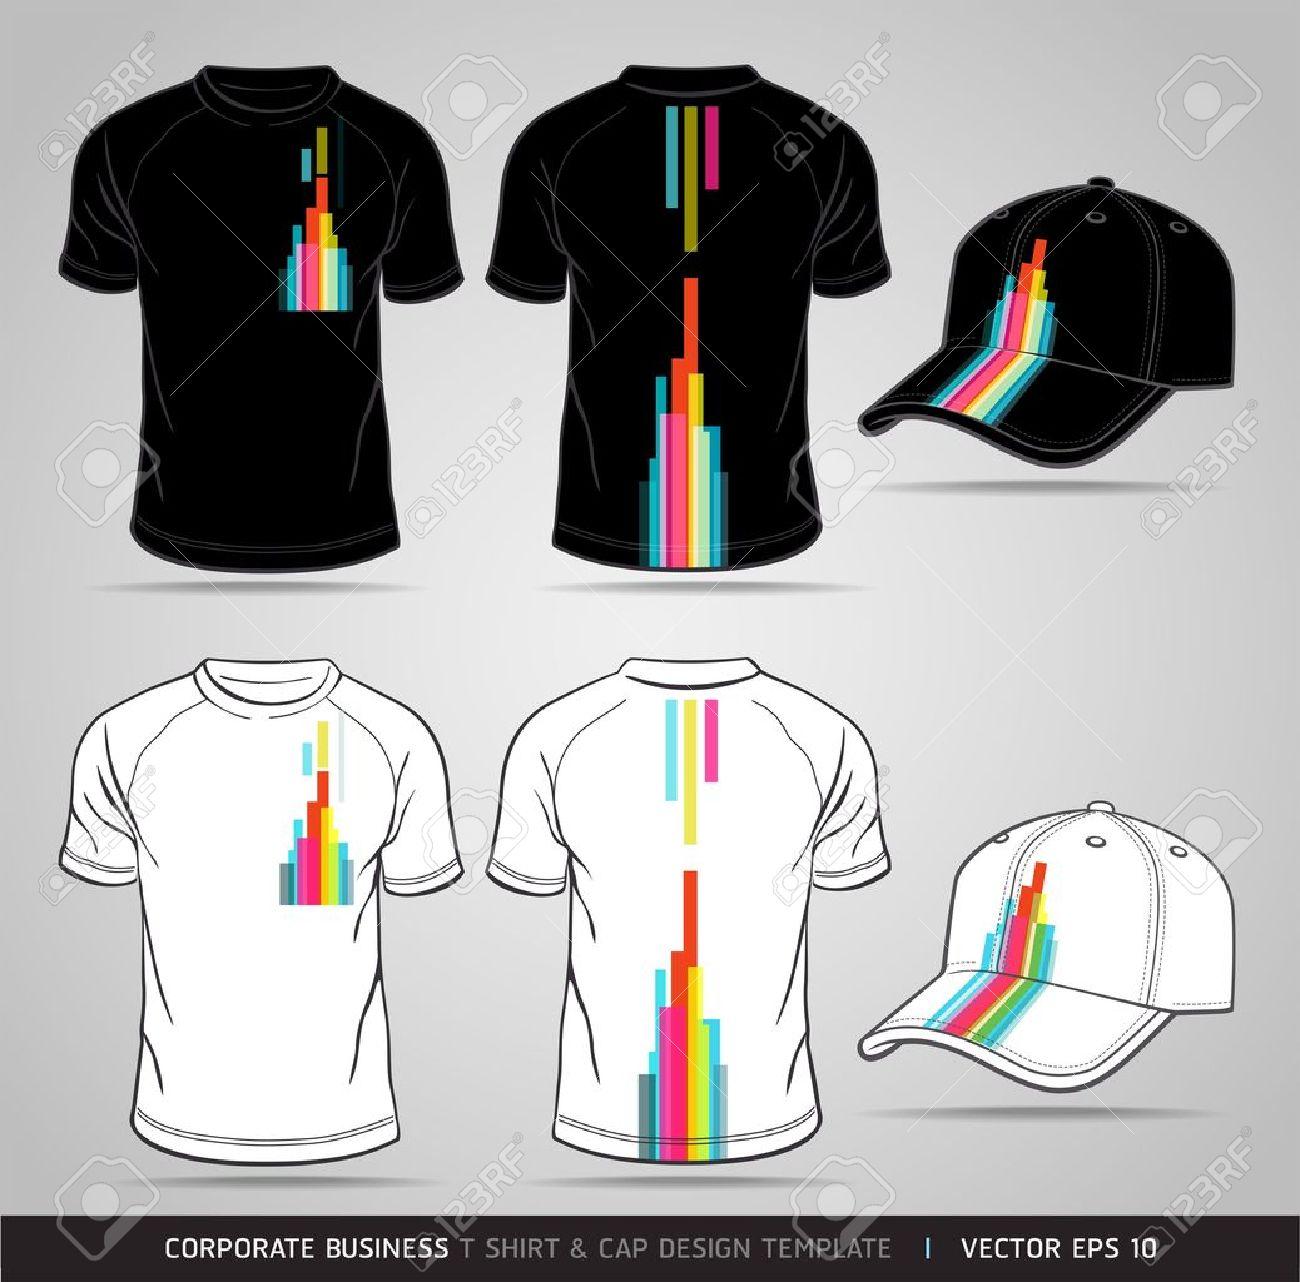 Shirt design template size - T Shirt Size Corporate Identity Business Set T Shirt And Cap Design Template